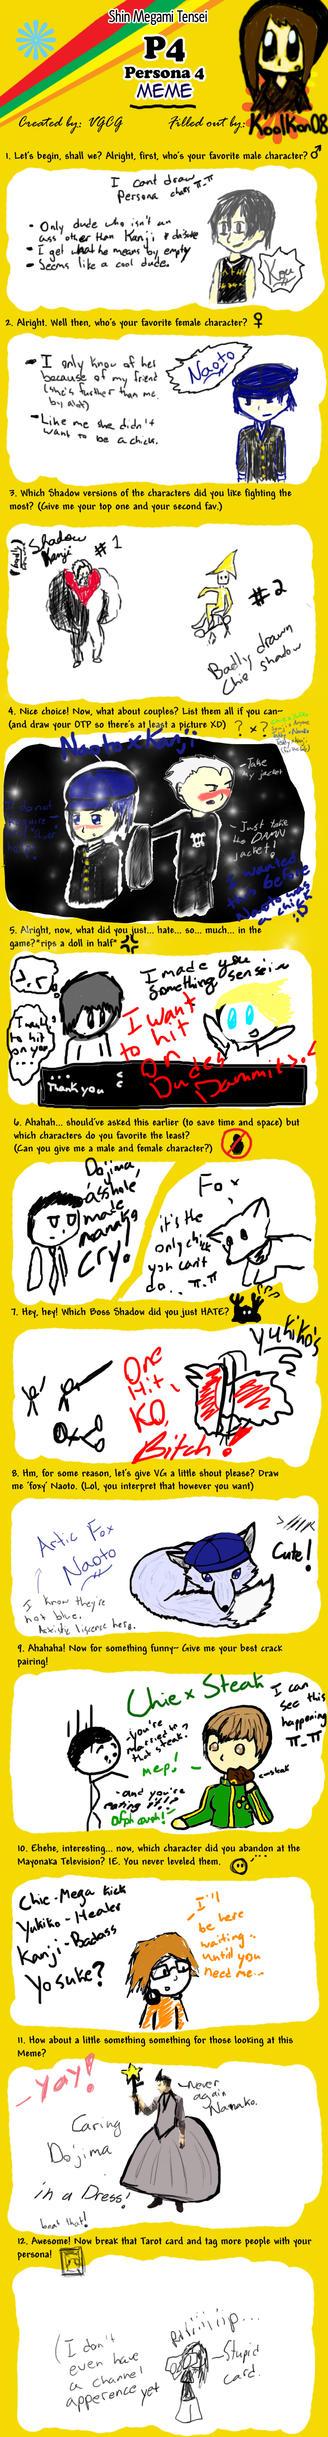 Persona 4 meme- The Lame Way by koolkon08